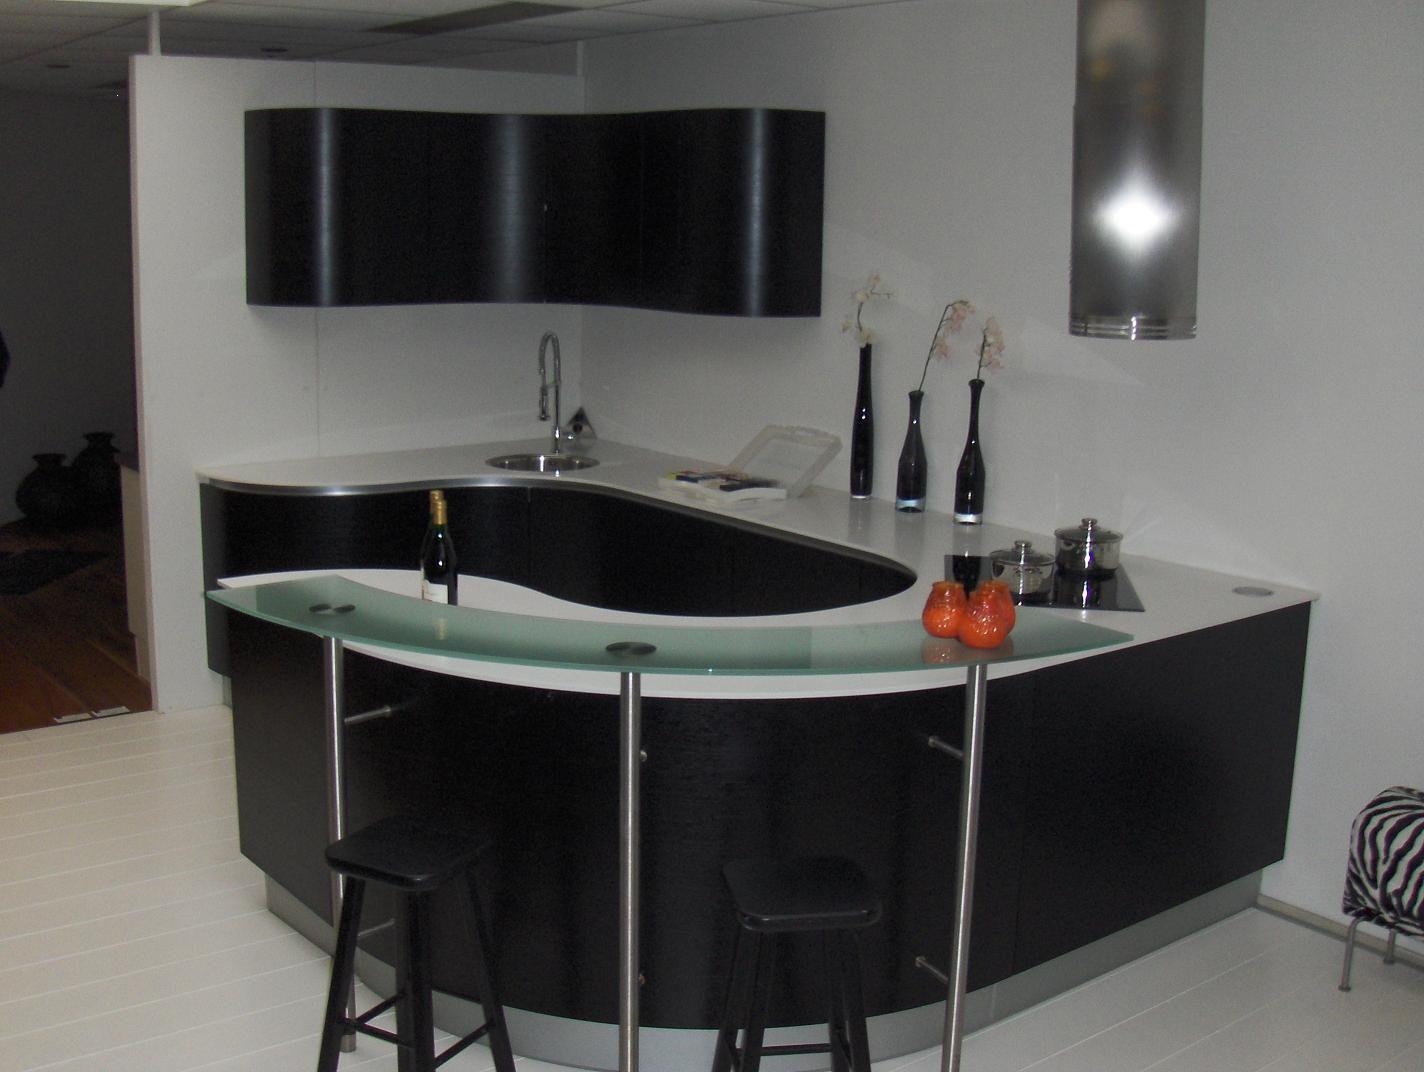 woonkamer tafel decoratie ~ lactate for ., Deco ideeën